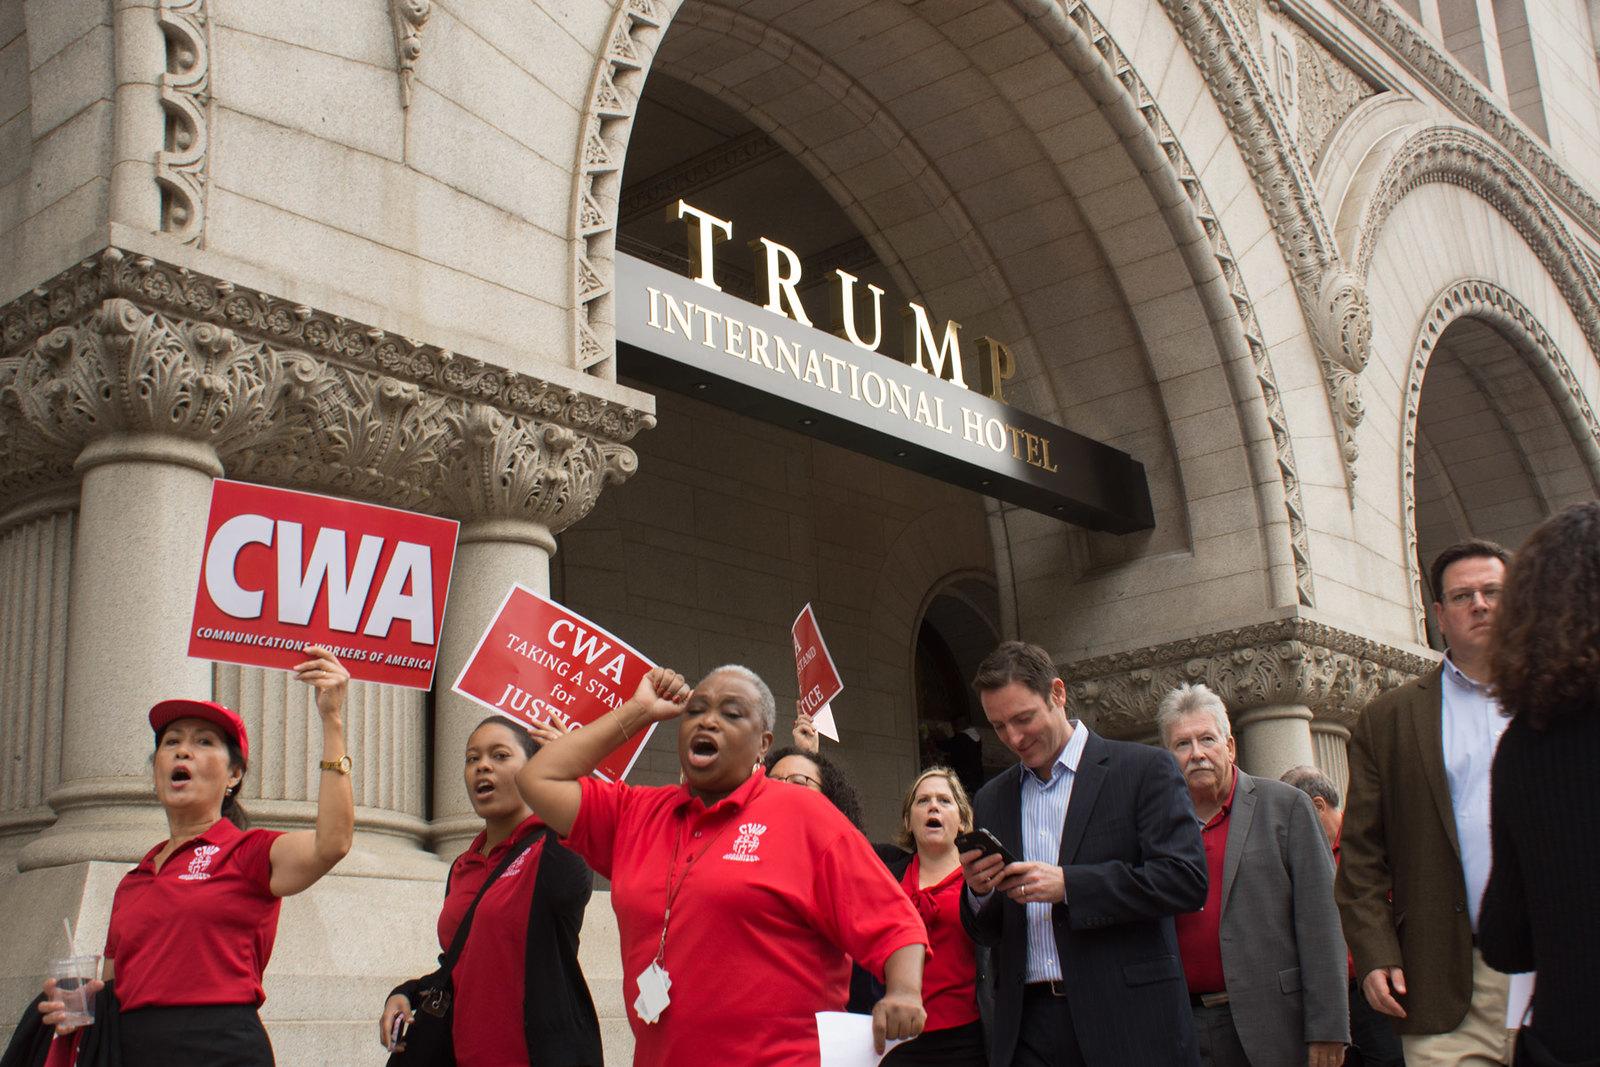 Picketing Trump Hotel